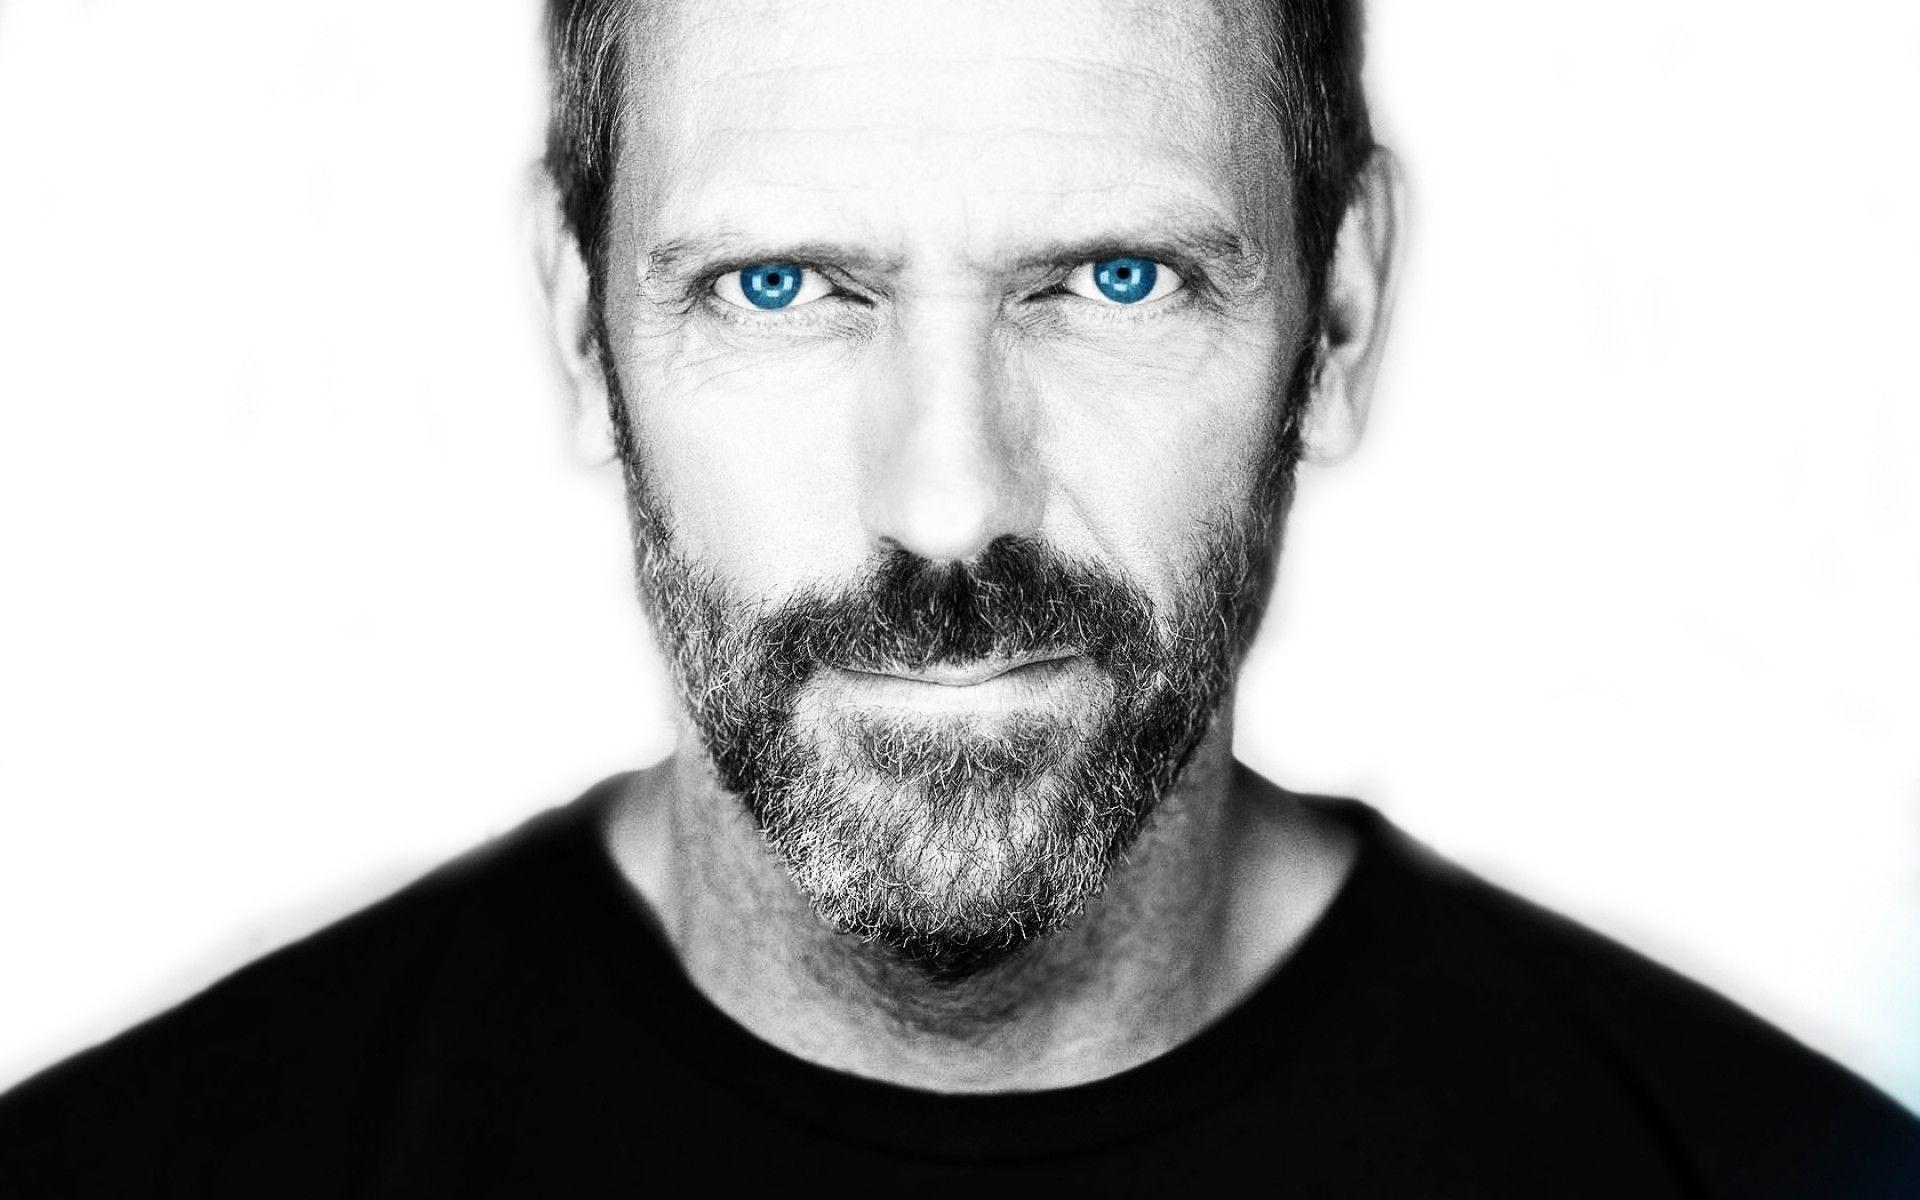 ... Hugh Laurie; Hugh Laurie